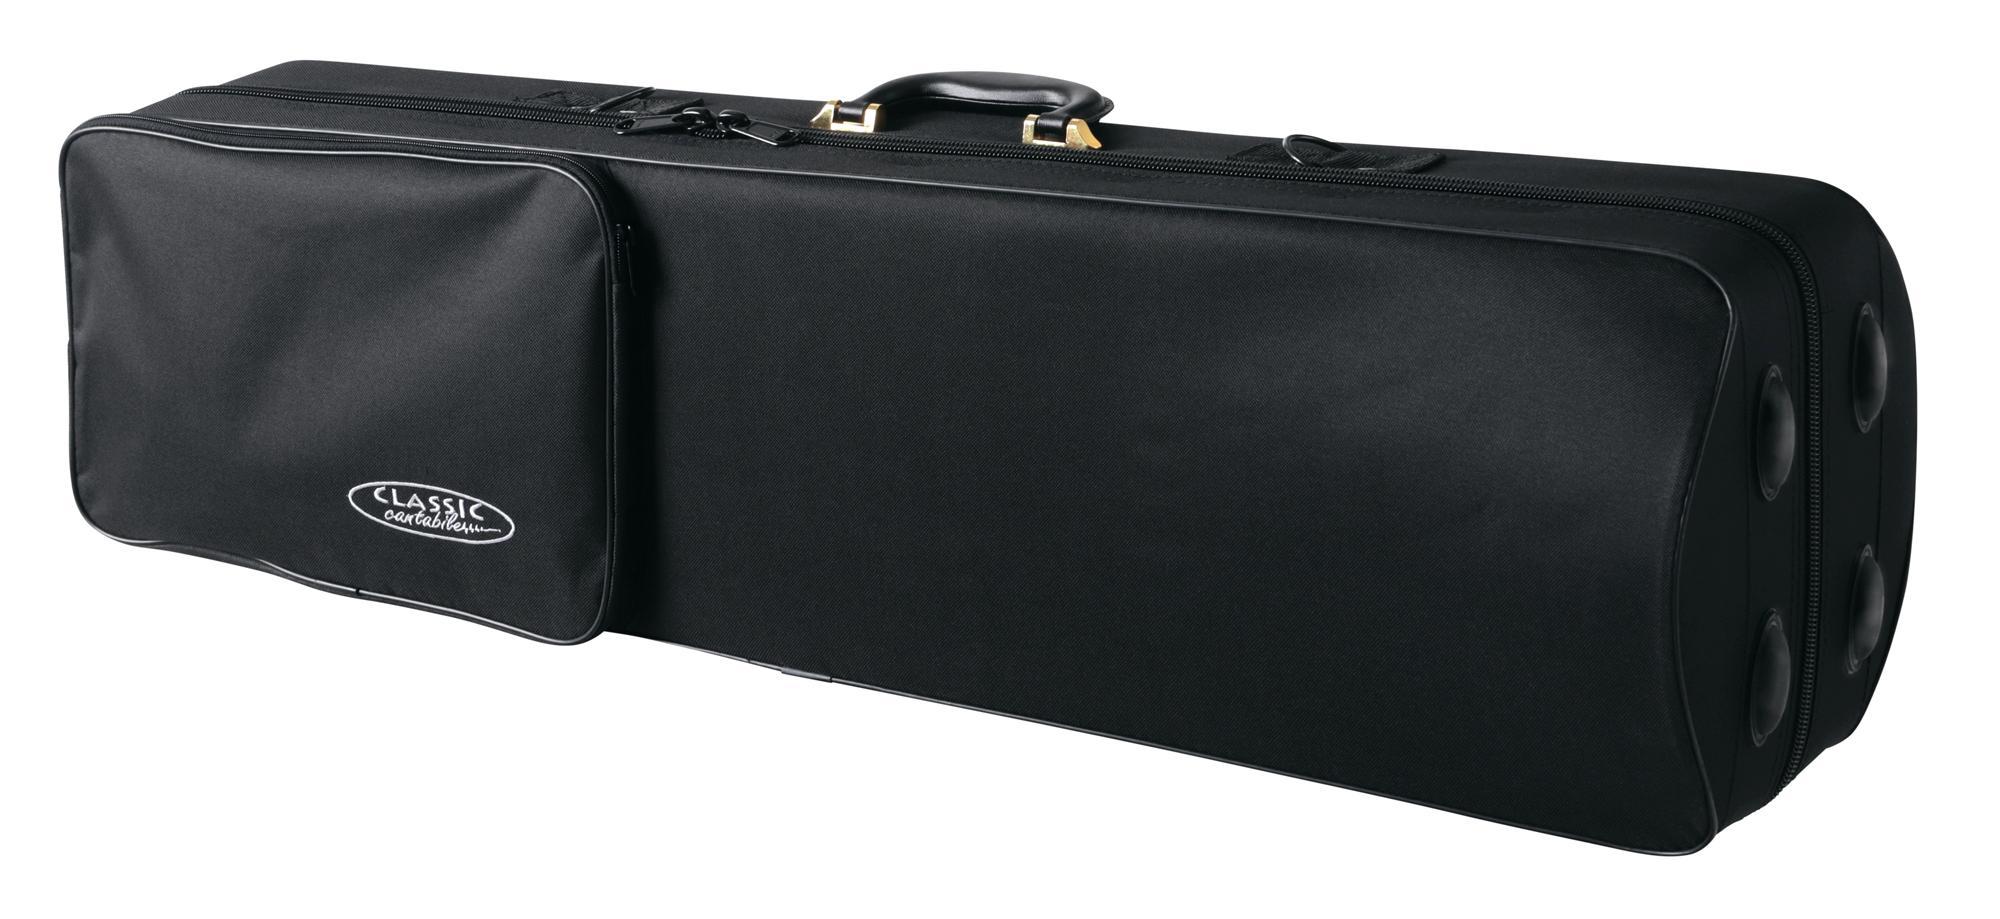 Classic Cantabile Koffer für Posaune